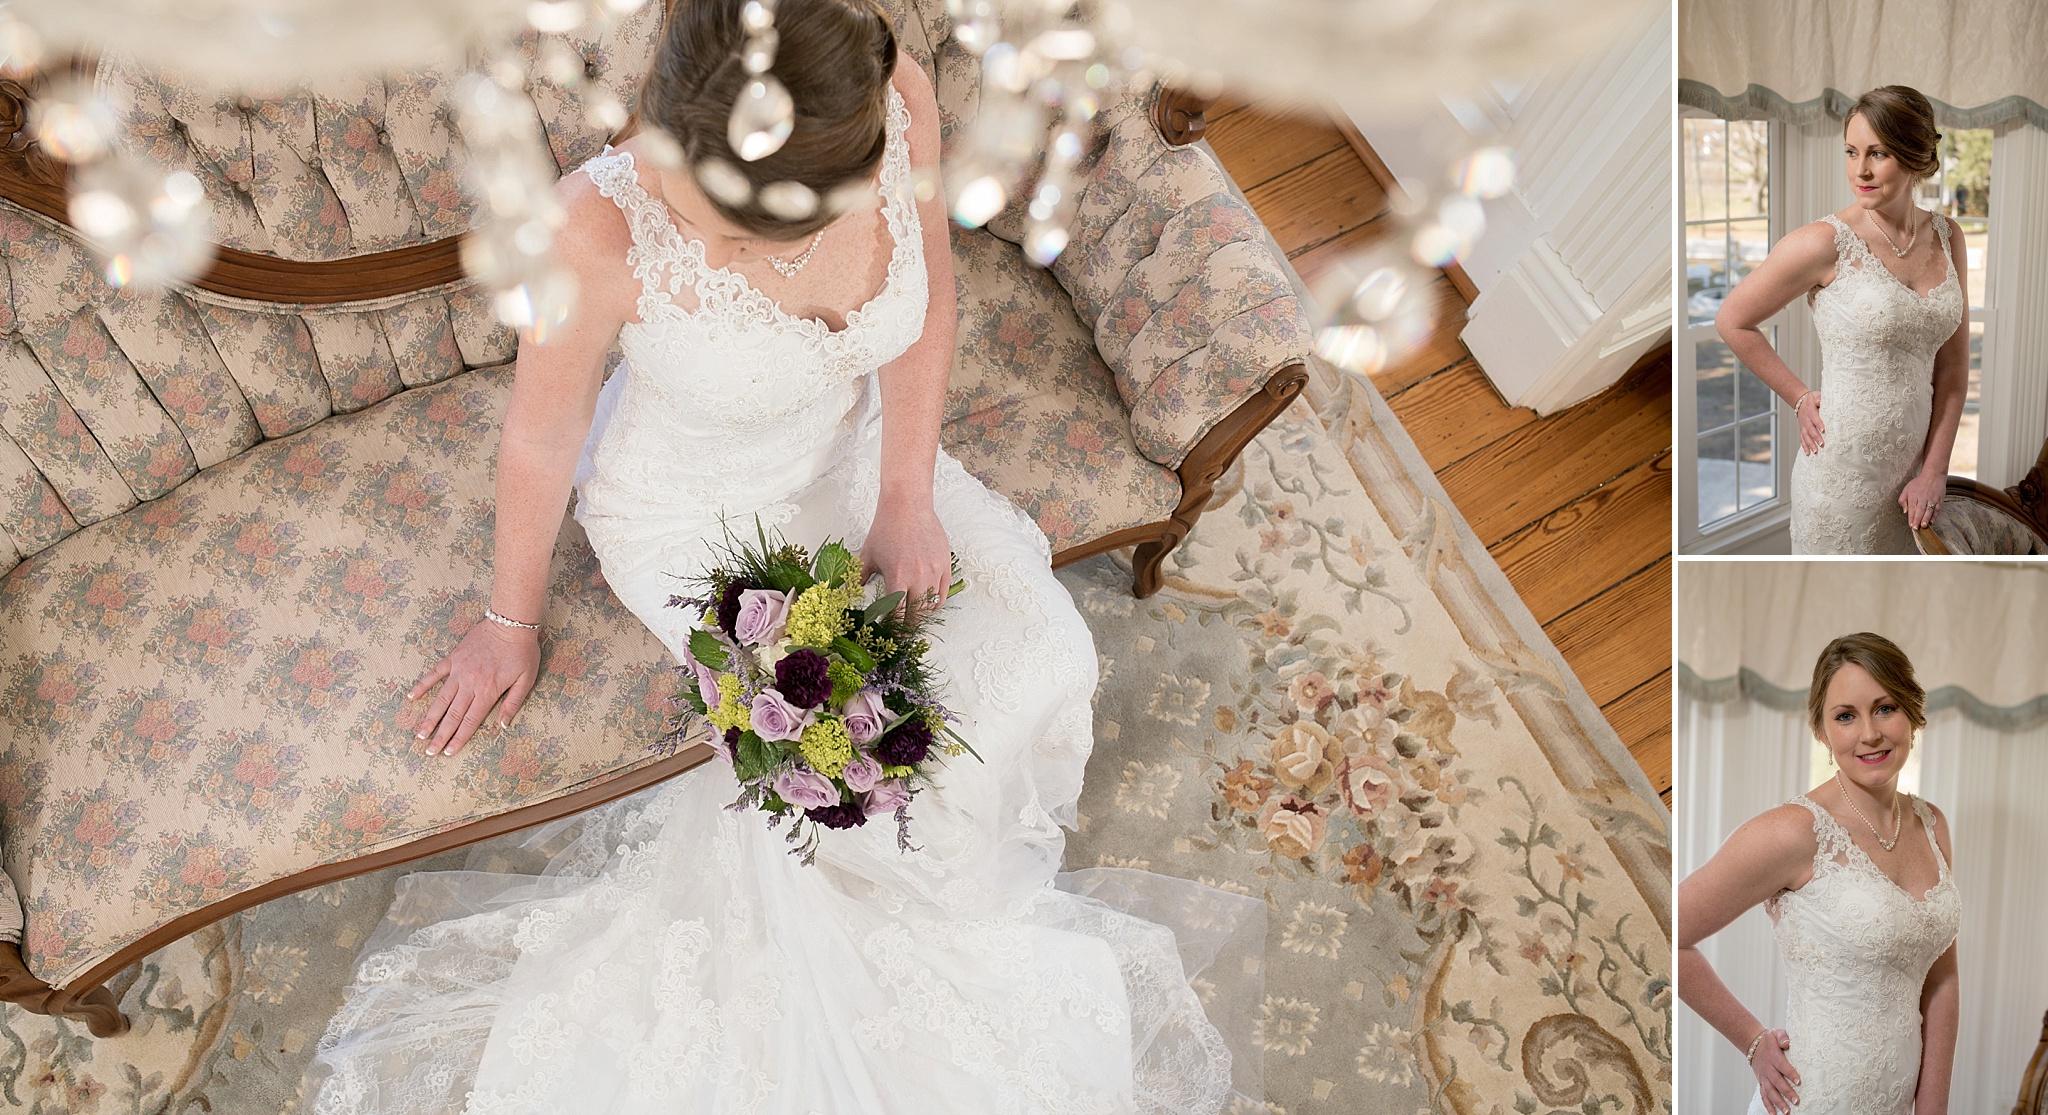 Yankee-Hall-Plantation-Wedding-NC-Photographer-0137.jpg